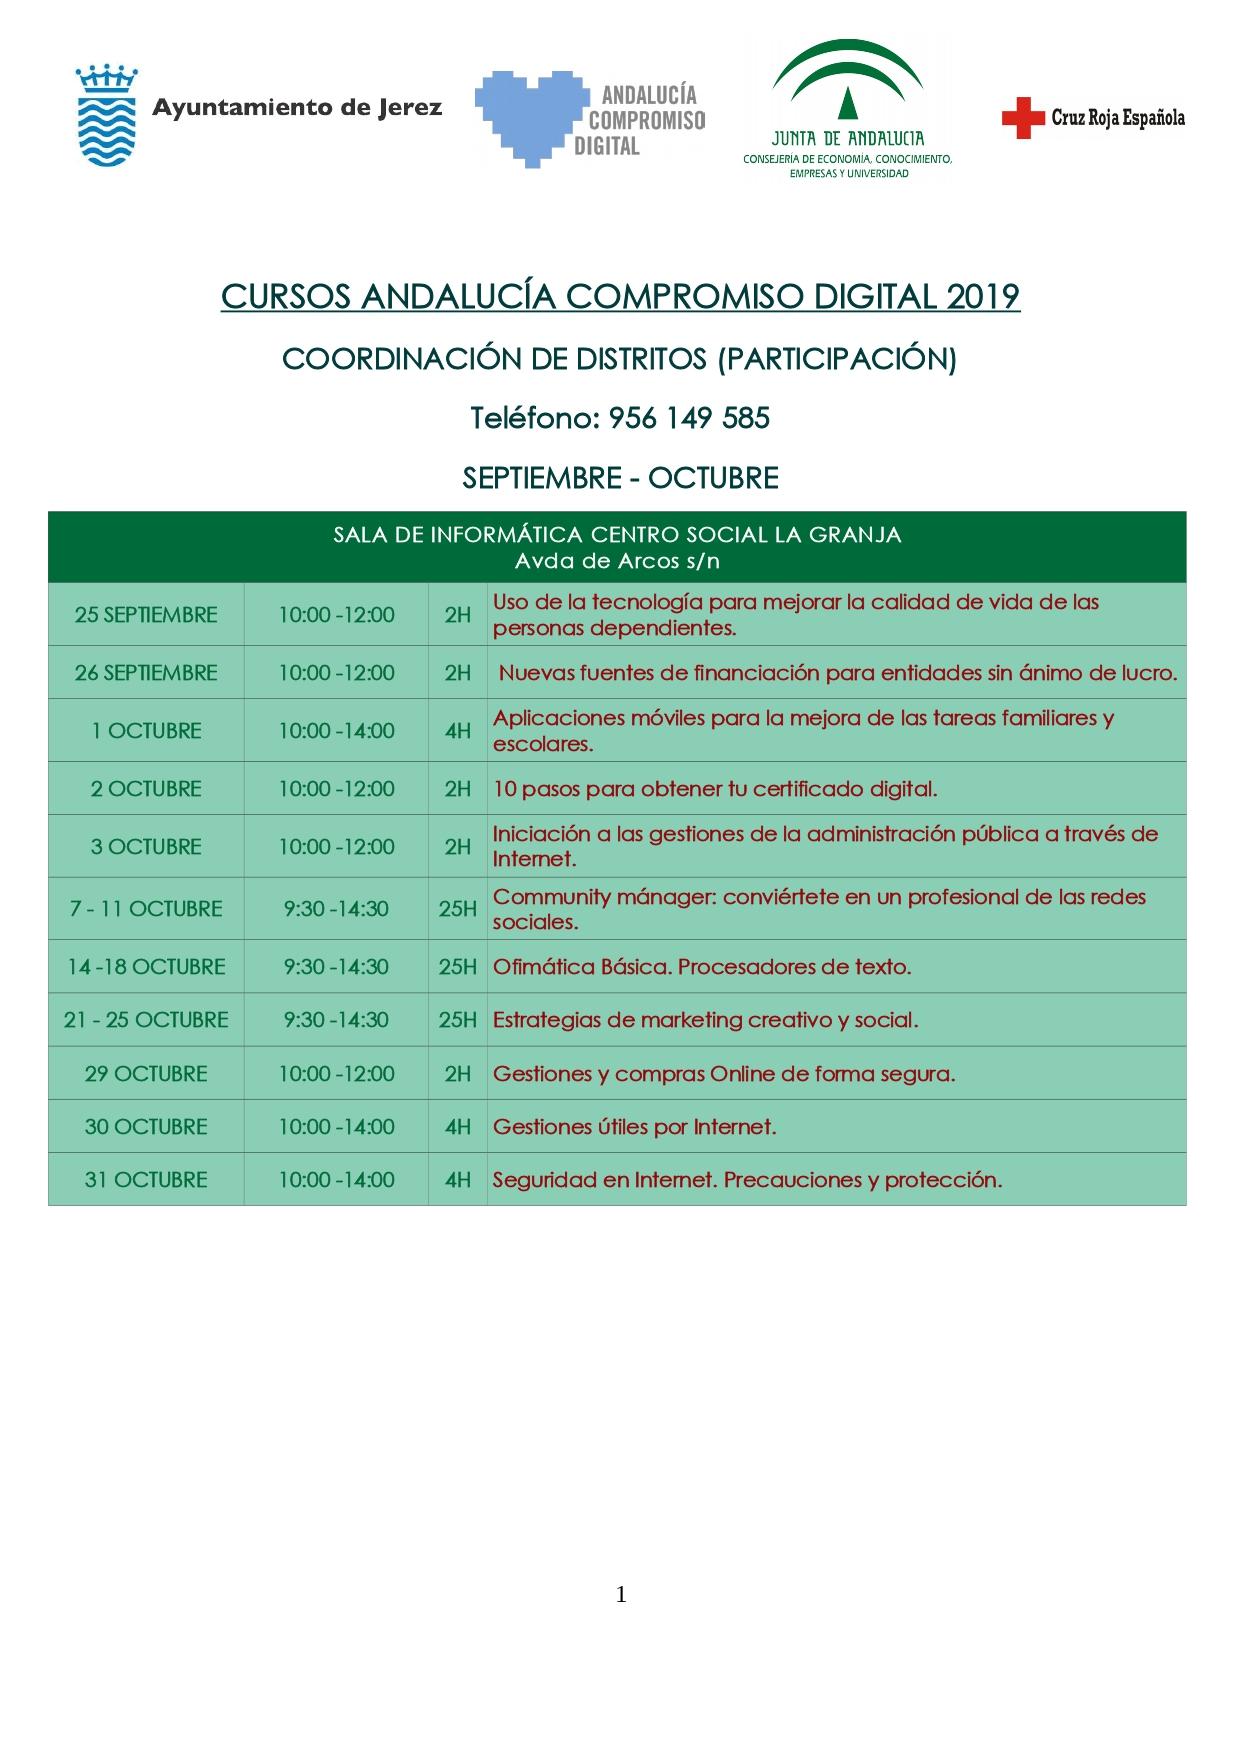 Cursos Andalucía Compromiso Digital. Tercer trimestre 2019. SALA DE INFORMÁTICA CENTRO SOCIAL LA GRANJA